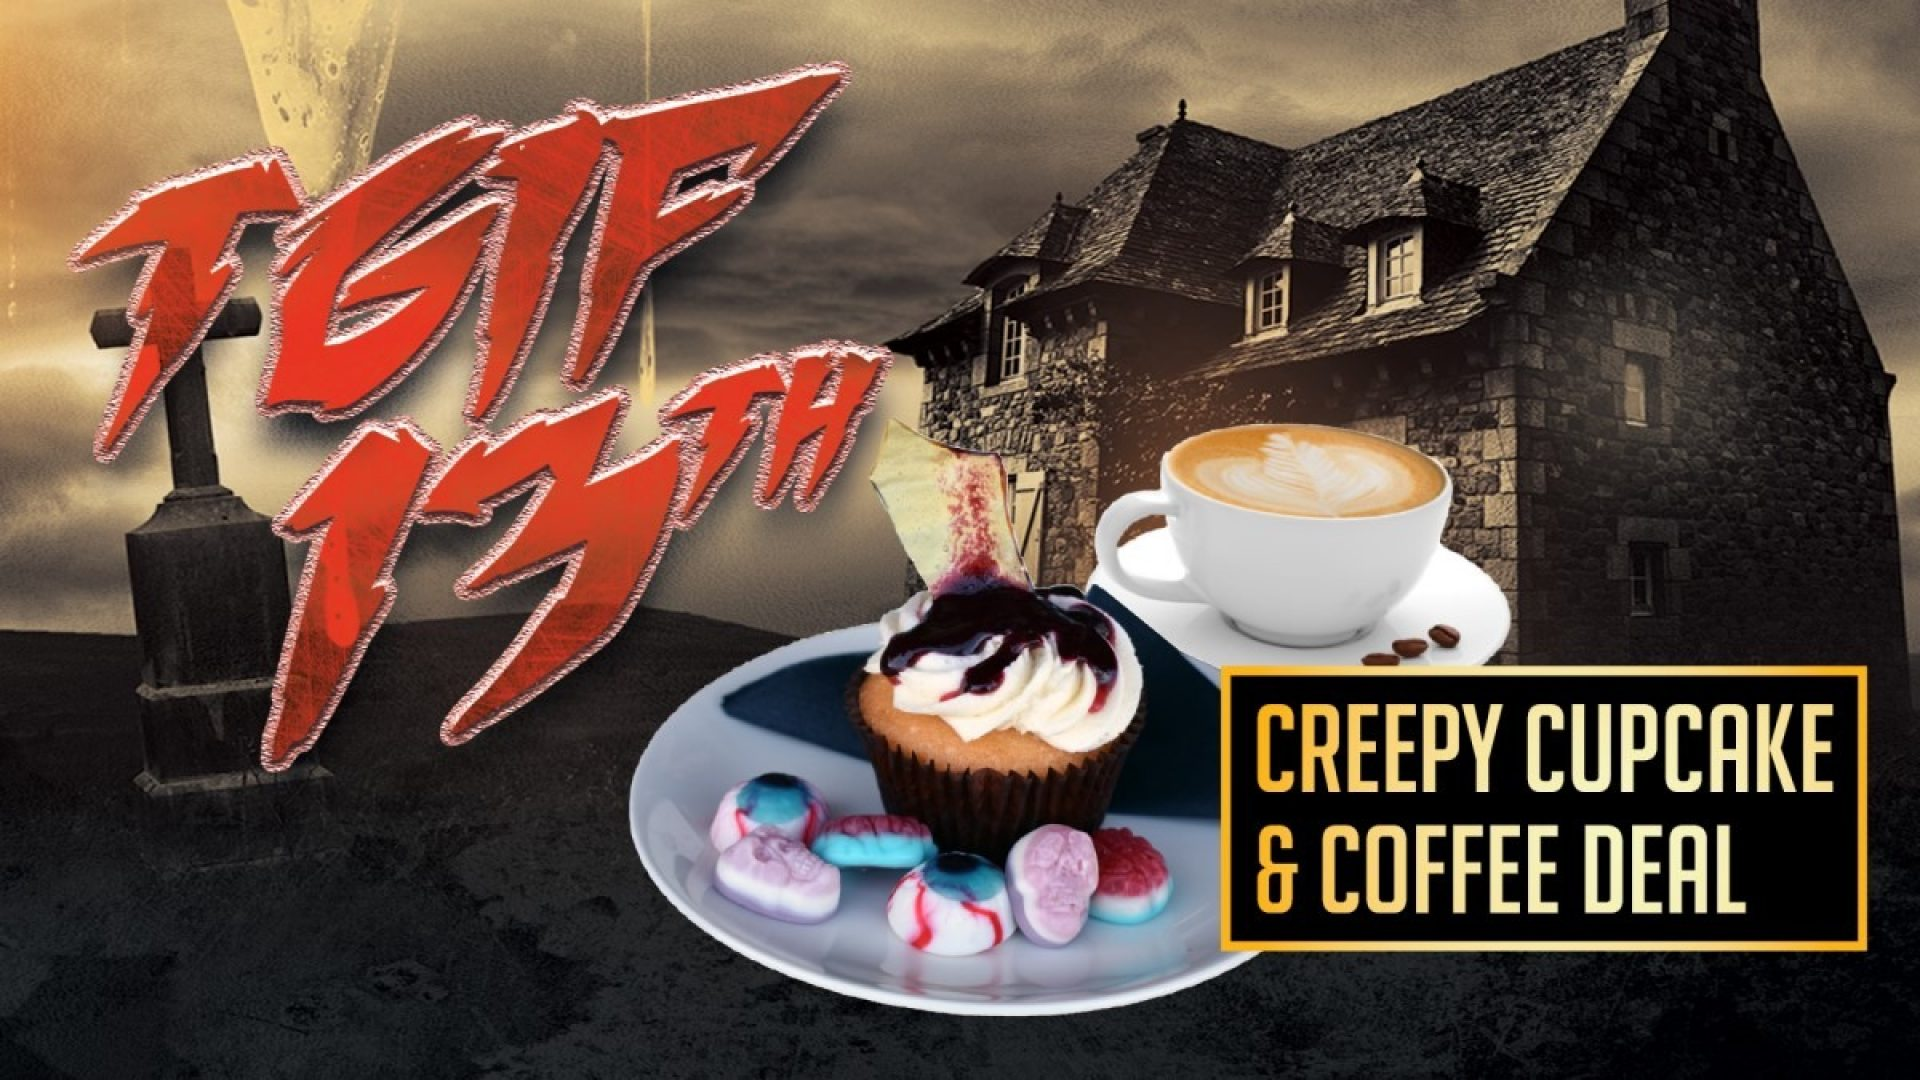 Cupcake deal